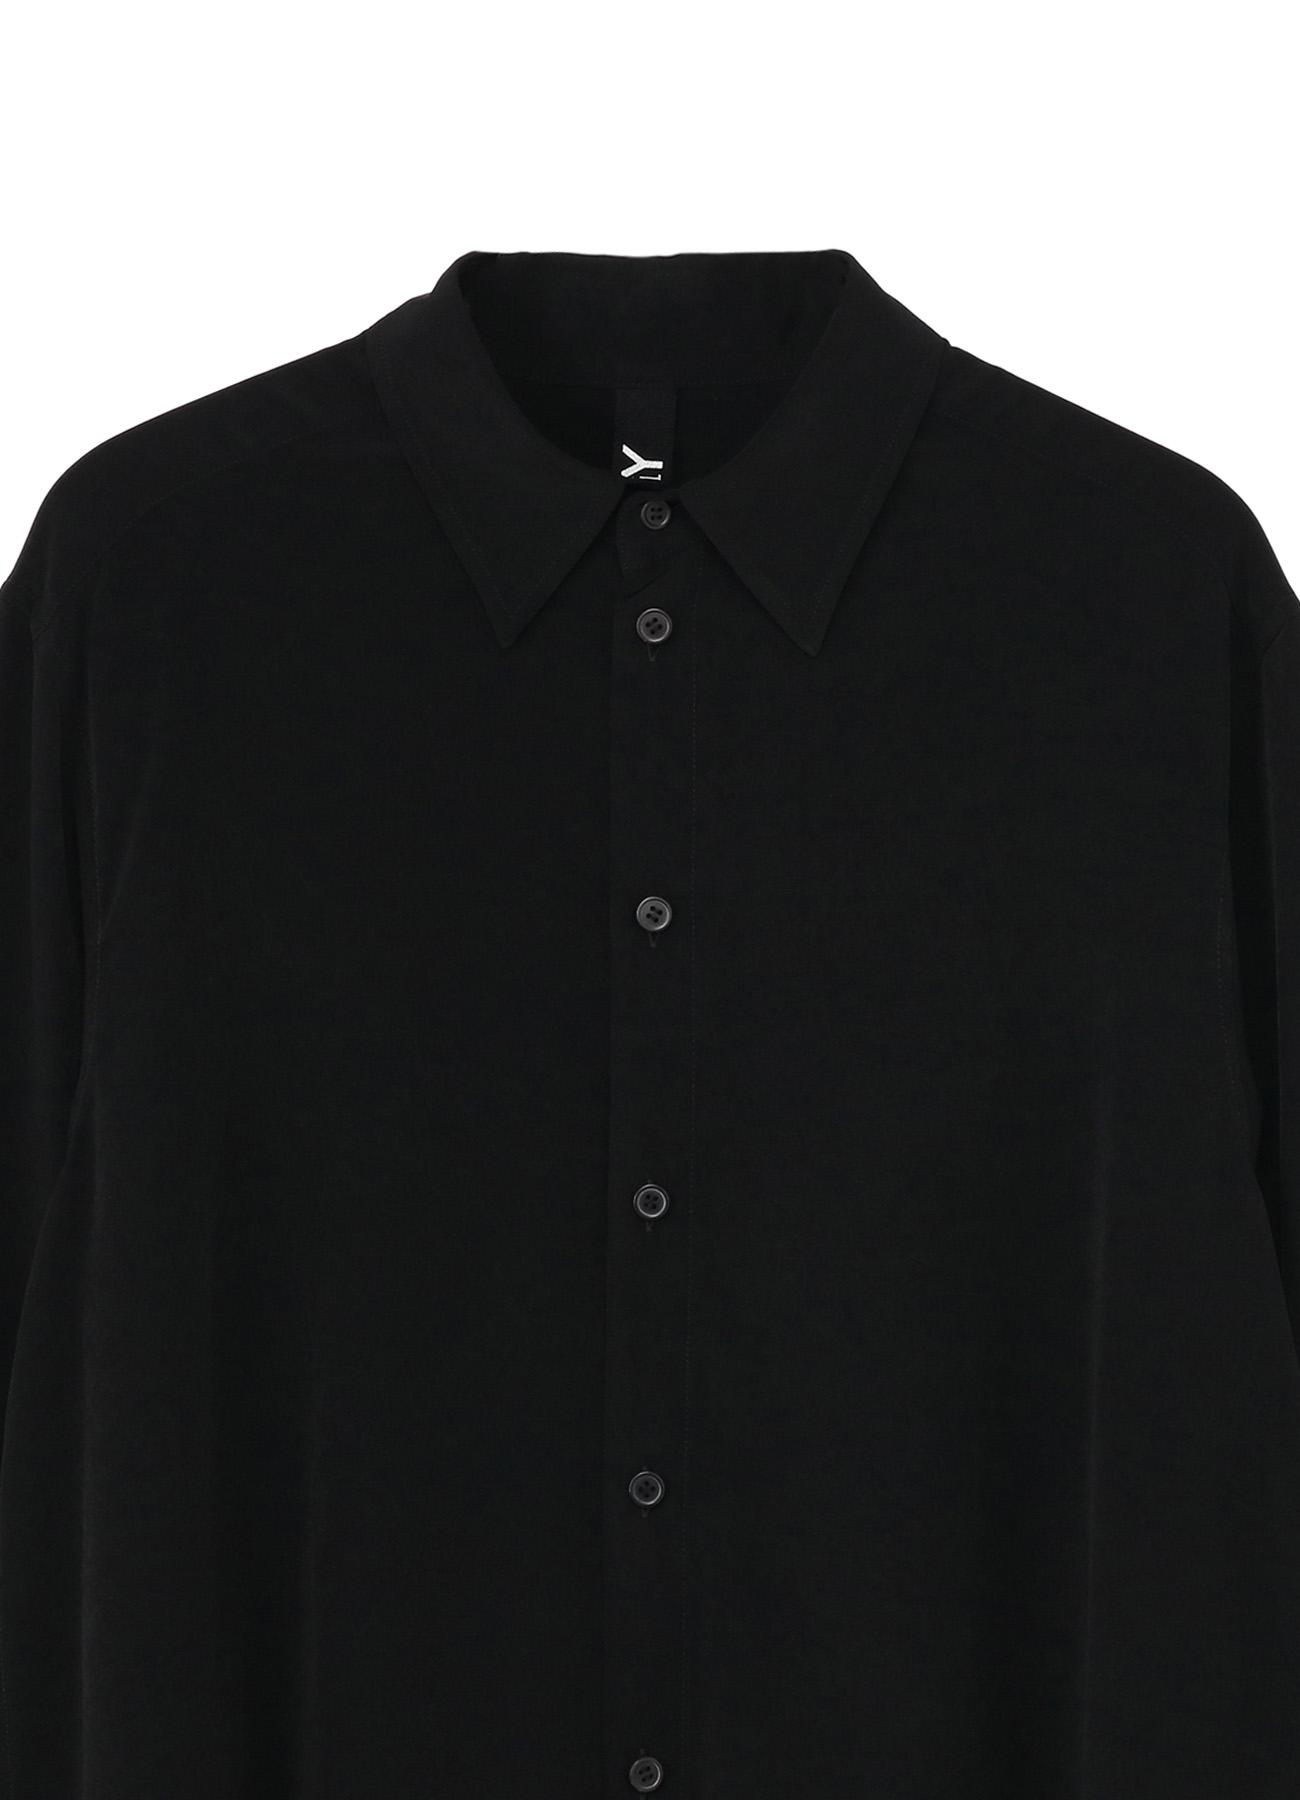 T/A Vintage Decyne Big Asymmetric Shirt